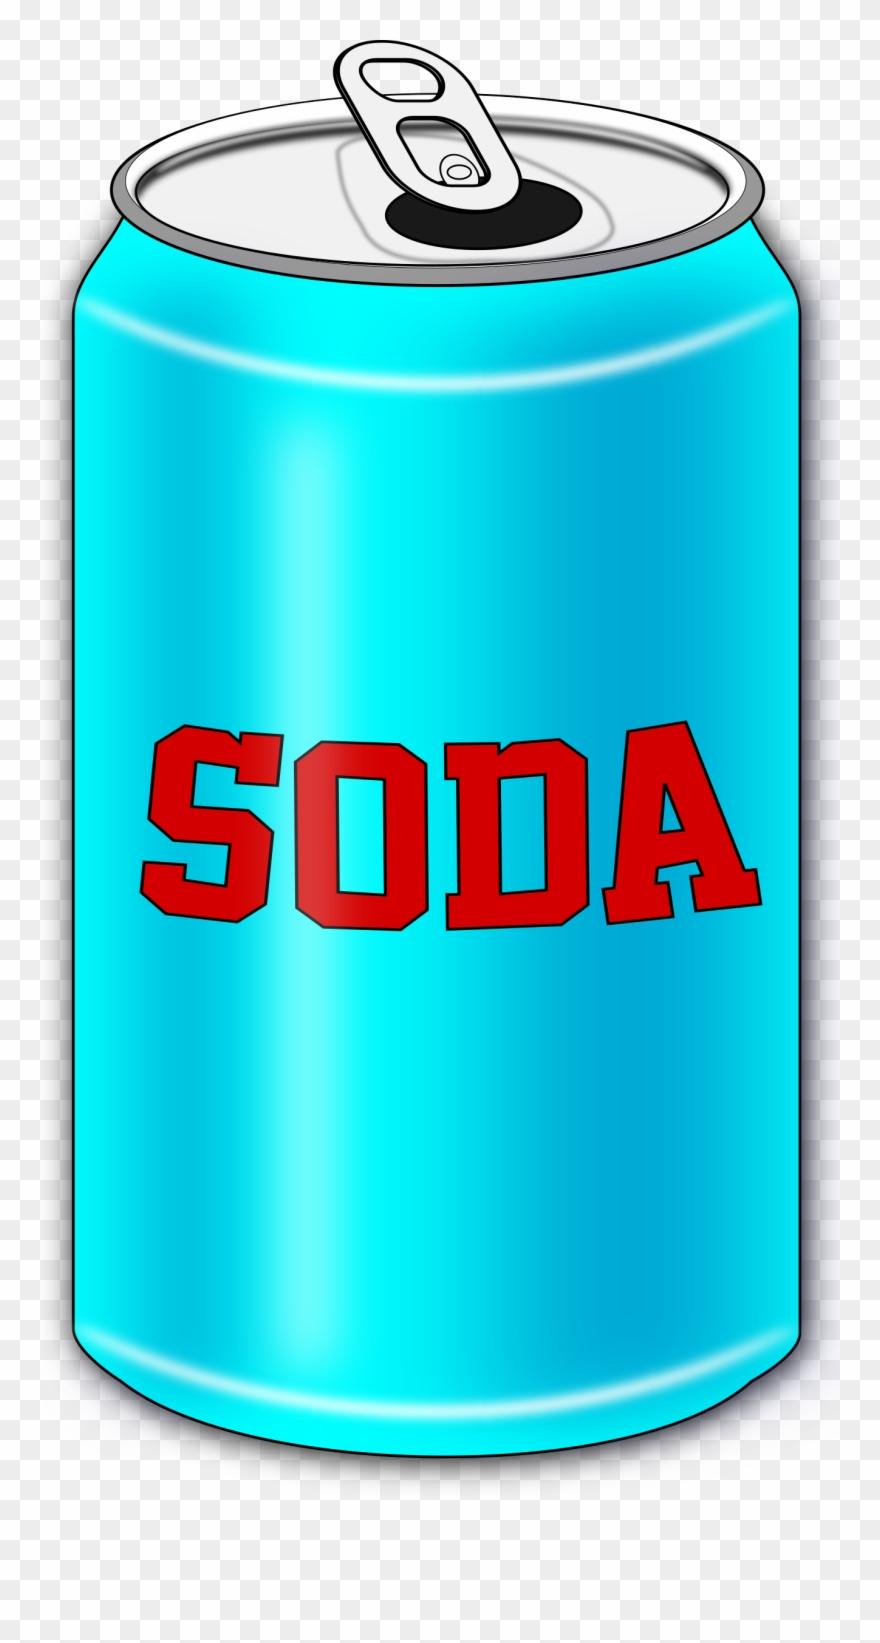 Soda Can.